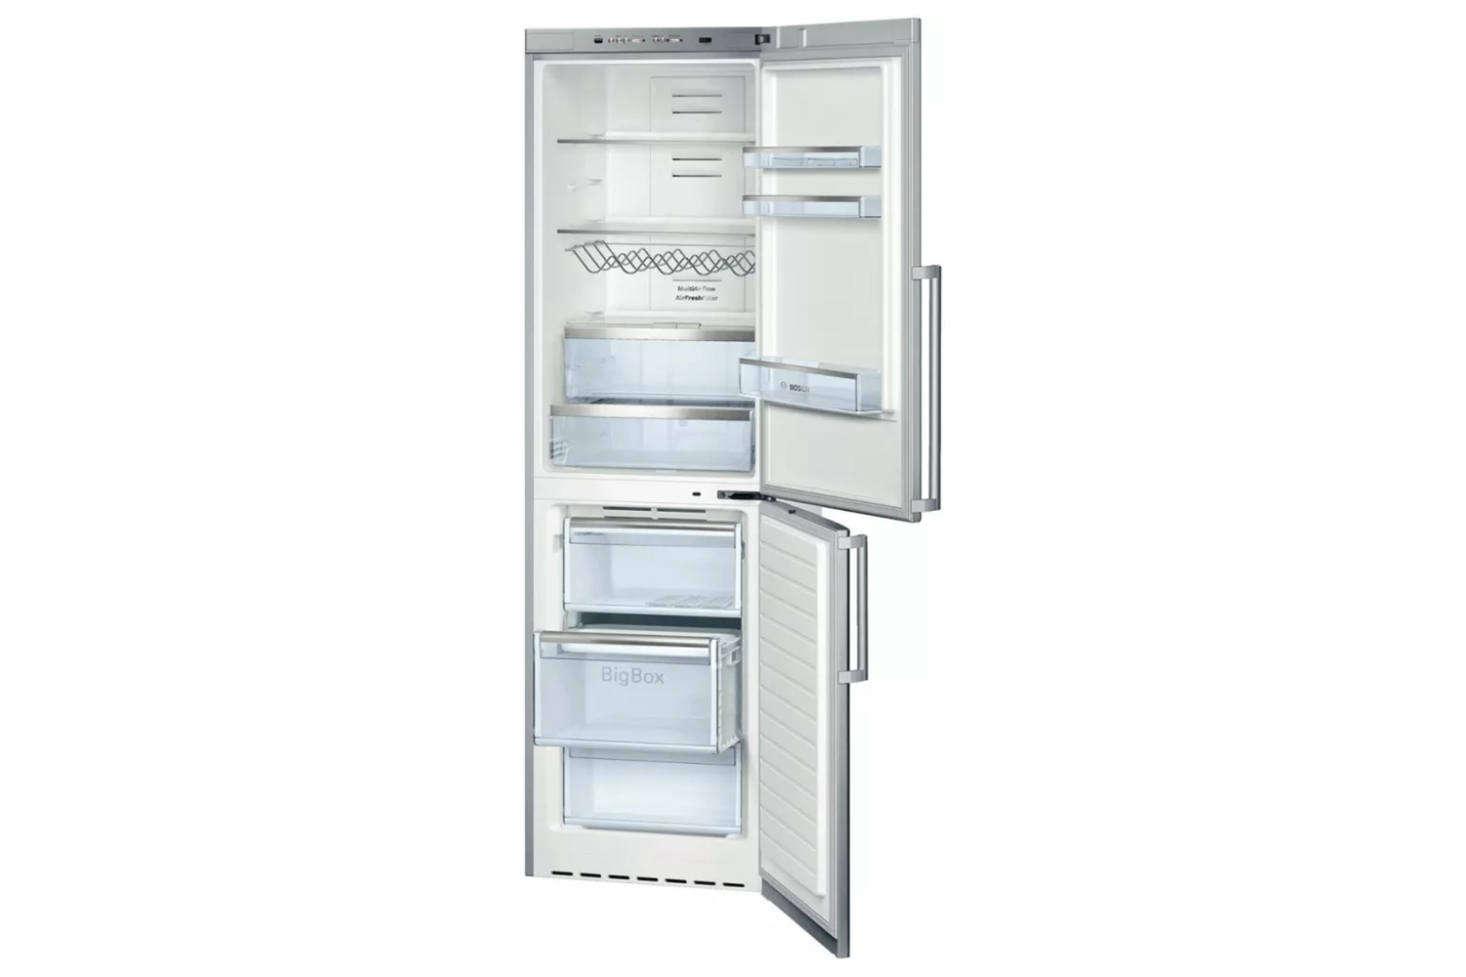 10 Easy Pieces Best 24 Inch Counter Depth Refrigerators